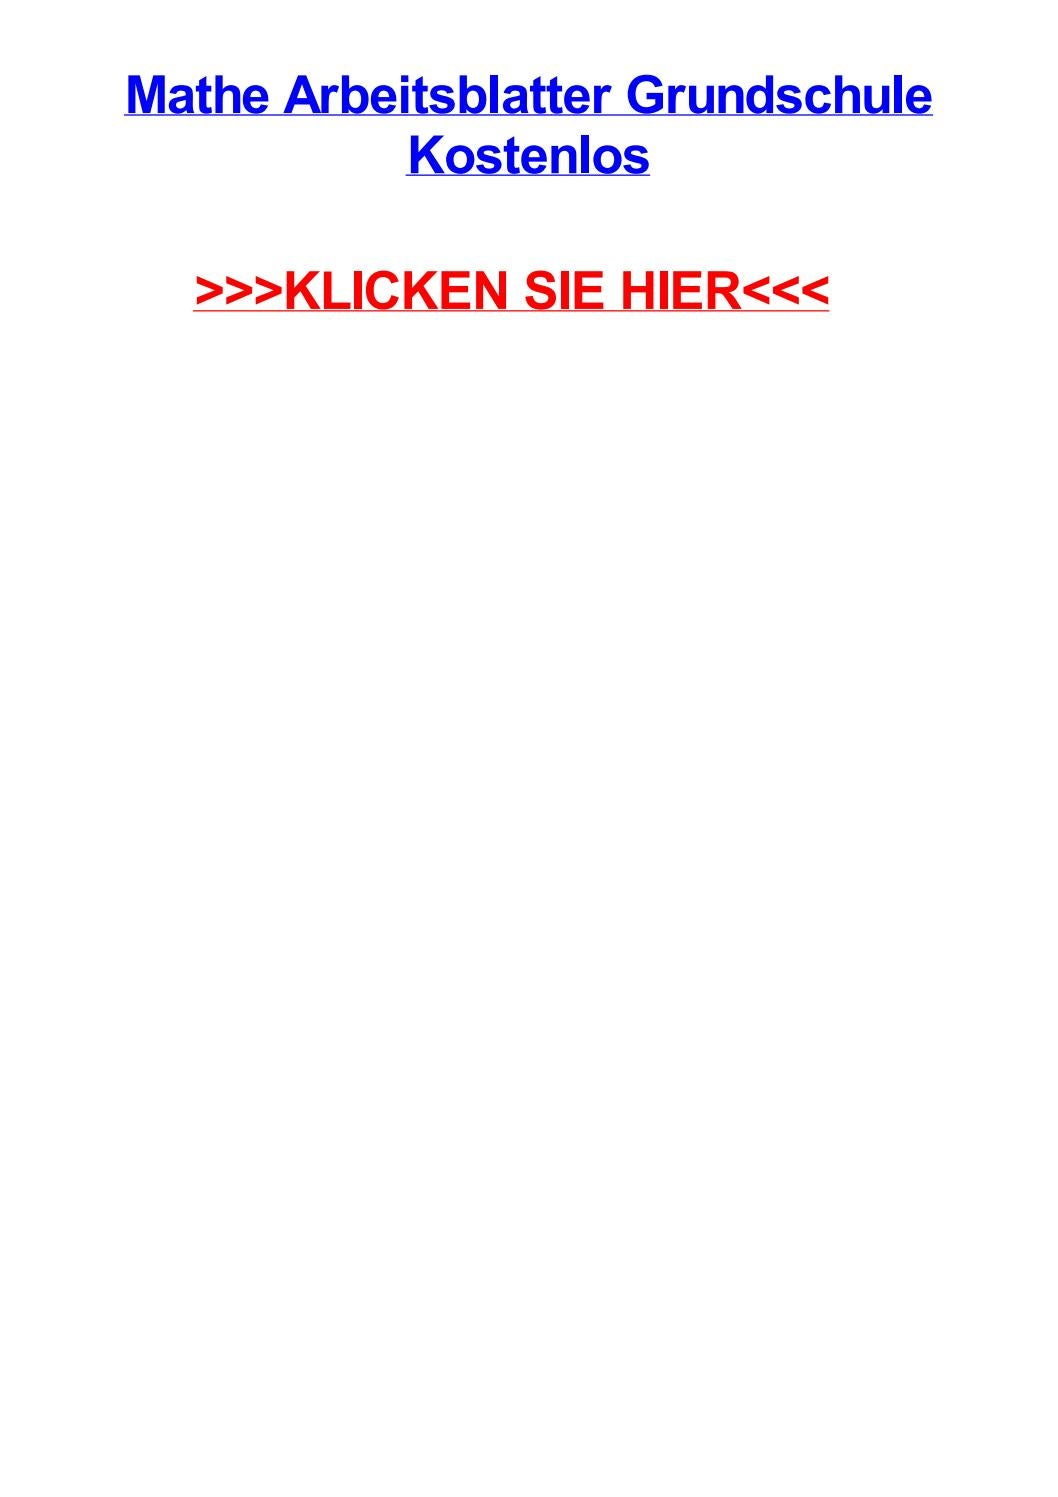 Mathe arbeitsblatter grundschule kostenlos by lisapjacf - issuu